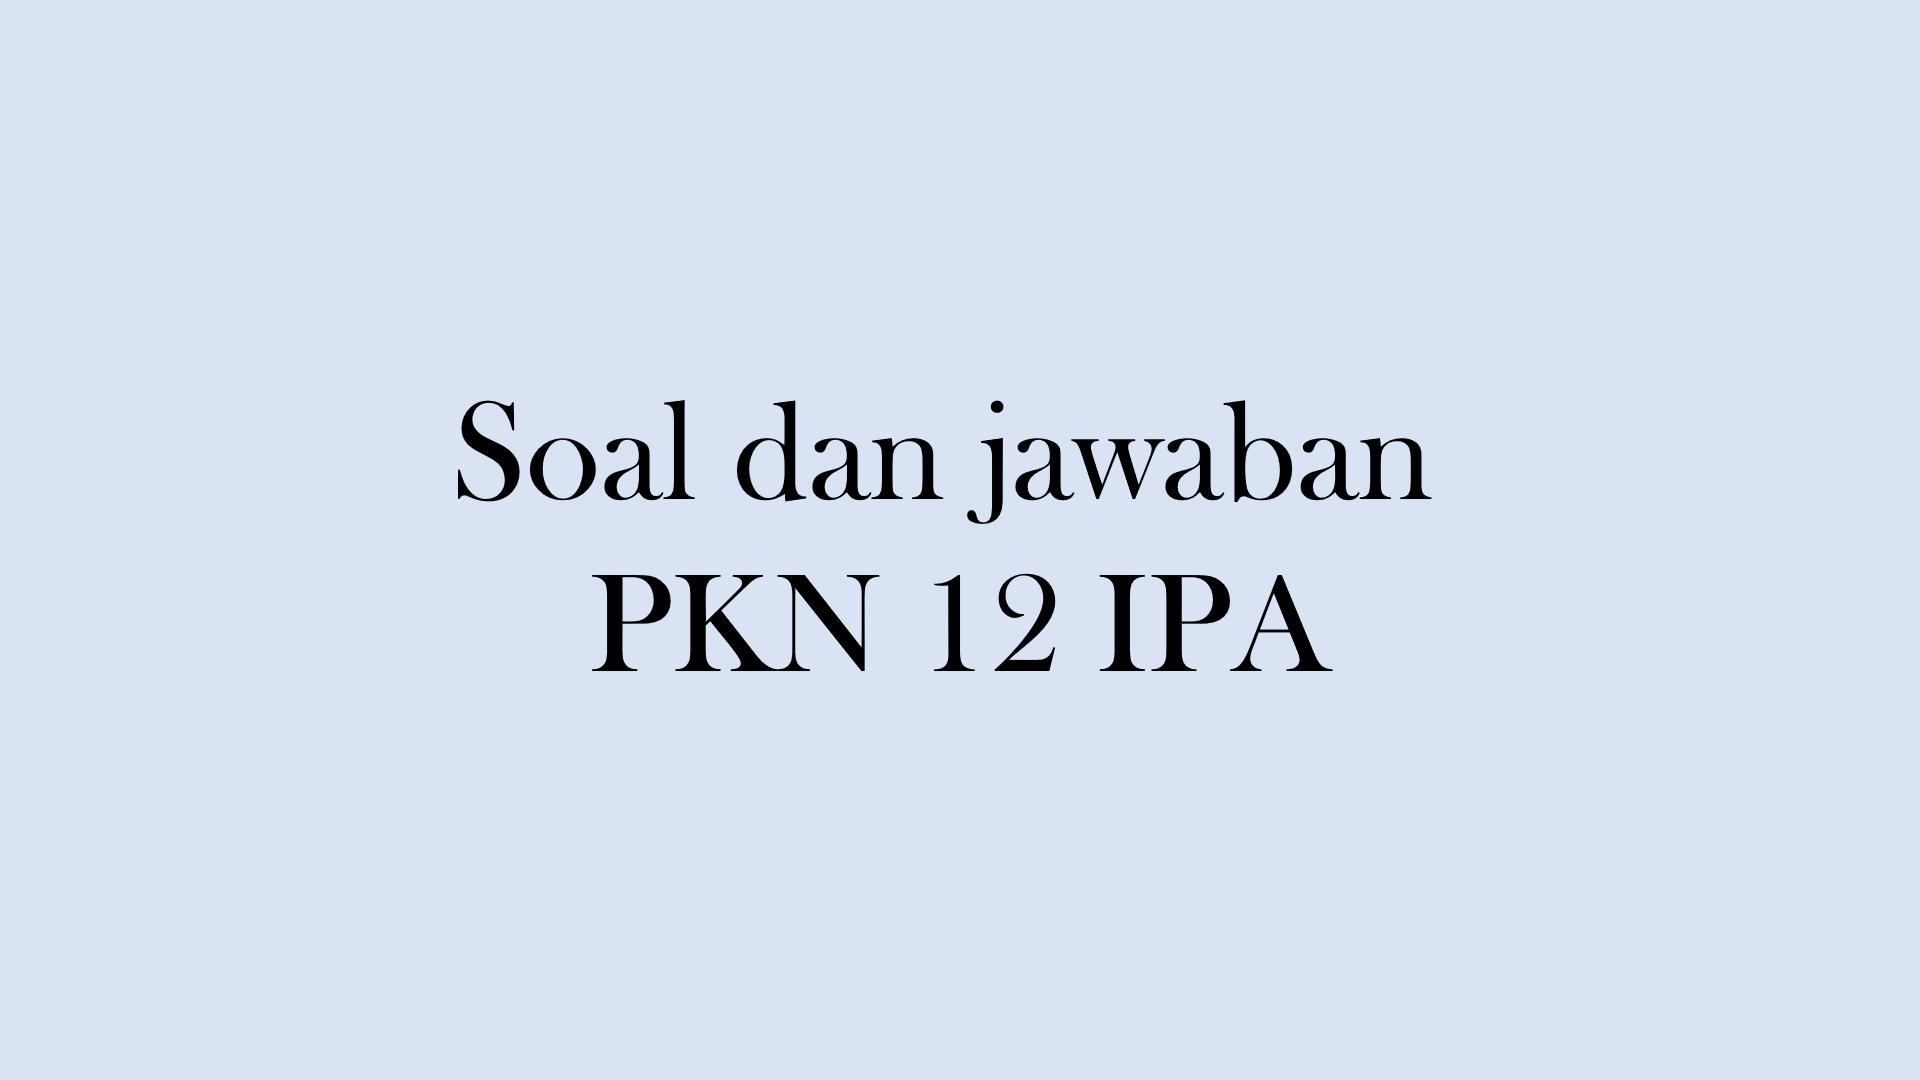 soal dan jawaban PKN kelas 12 Semester 2